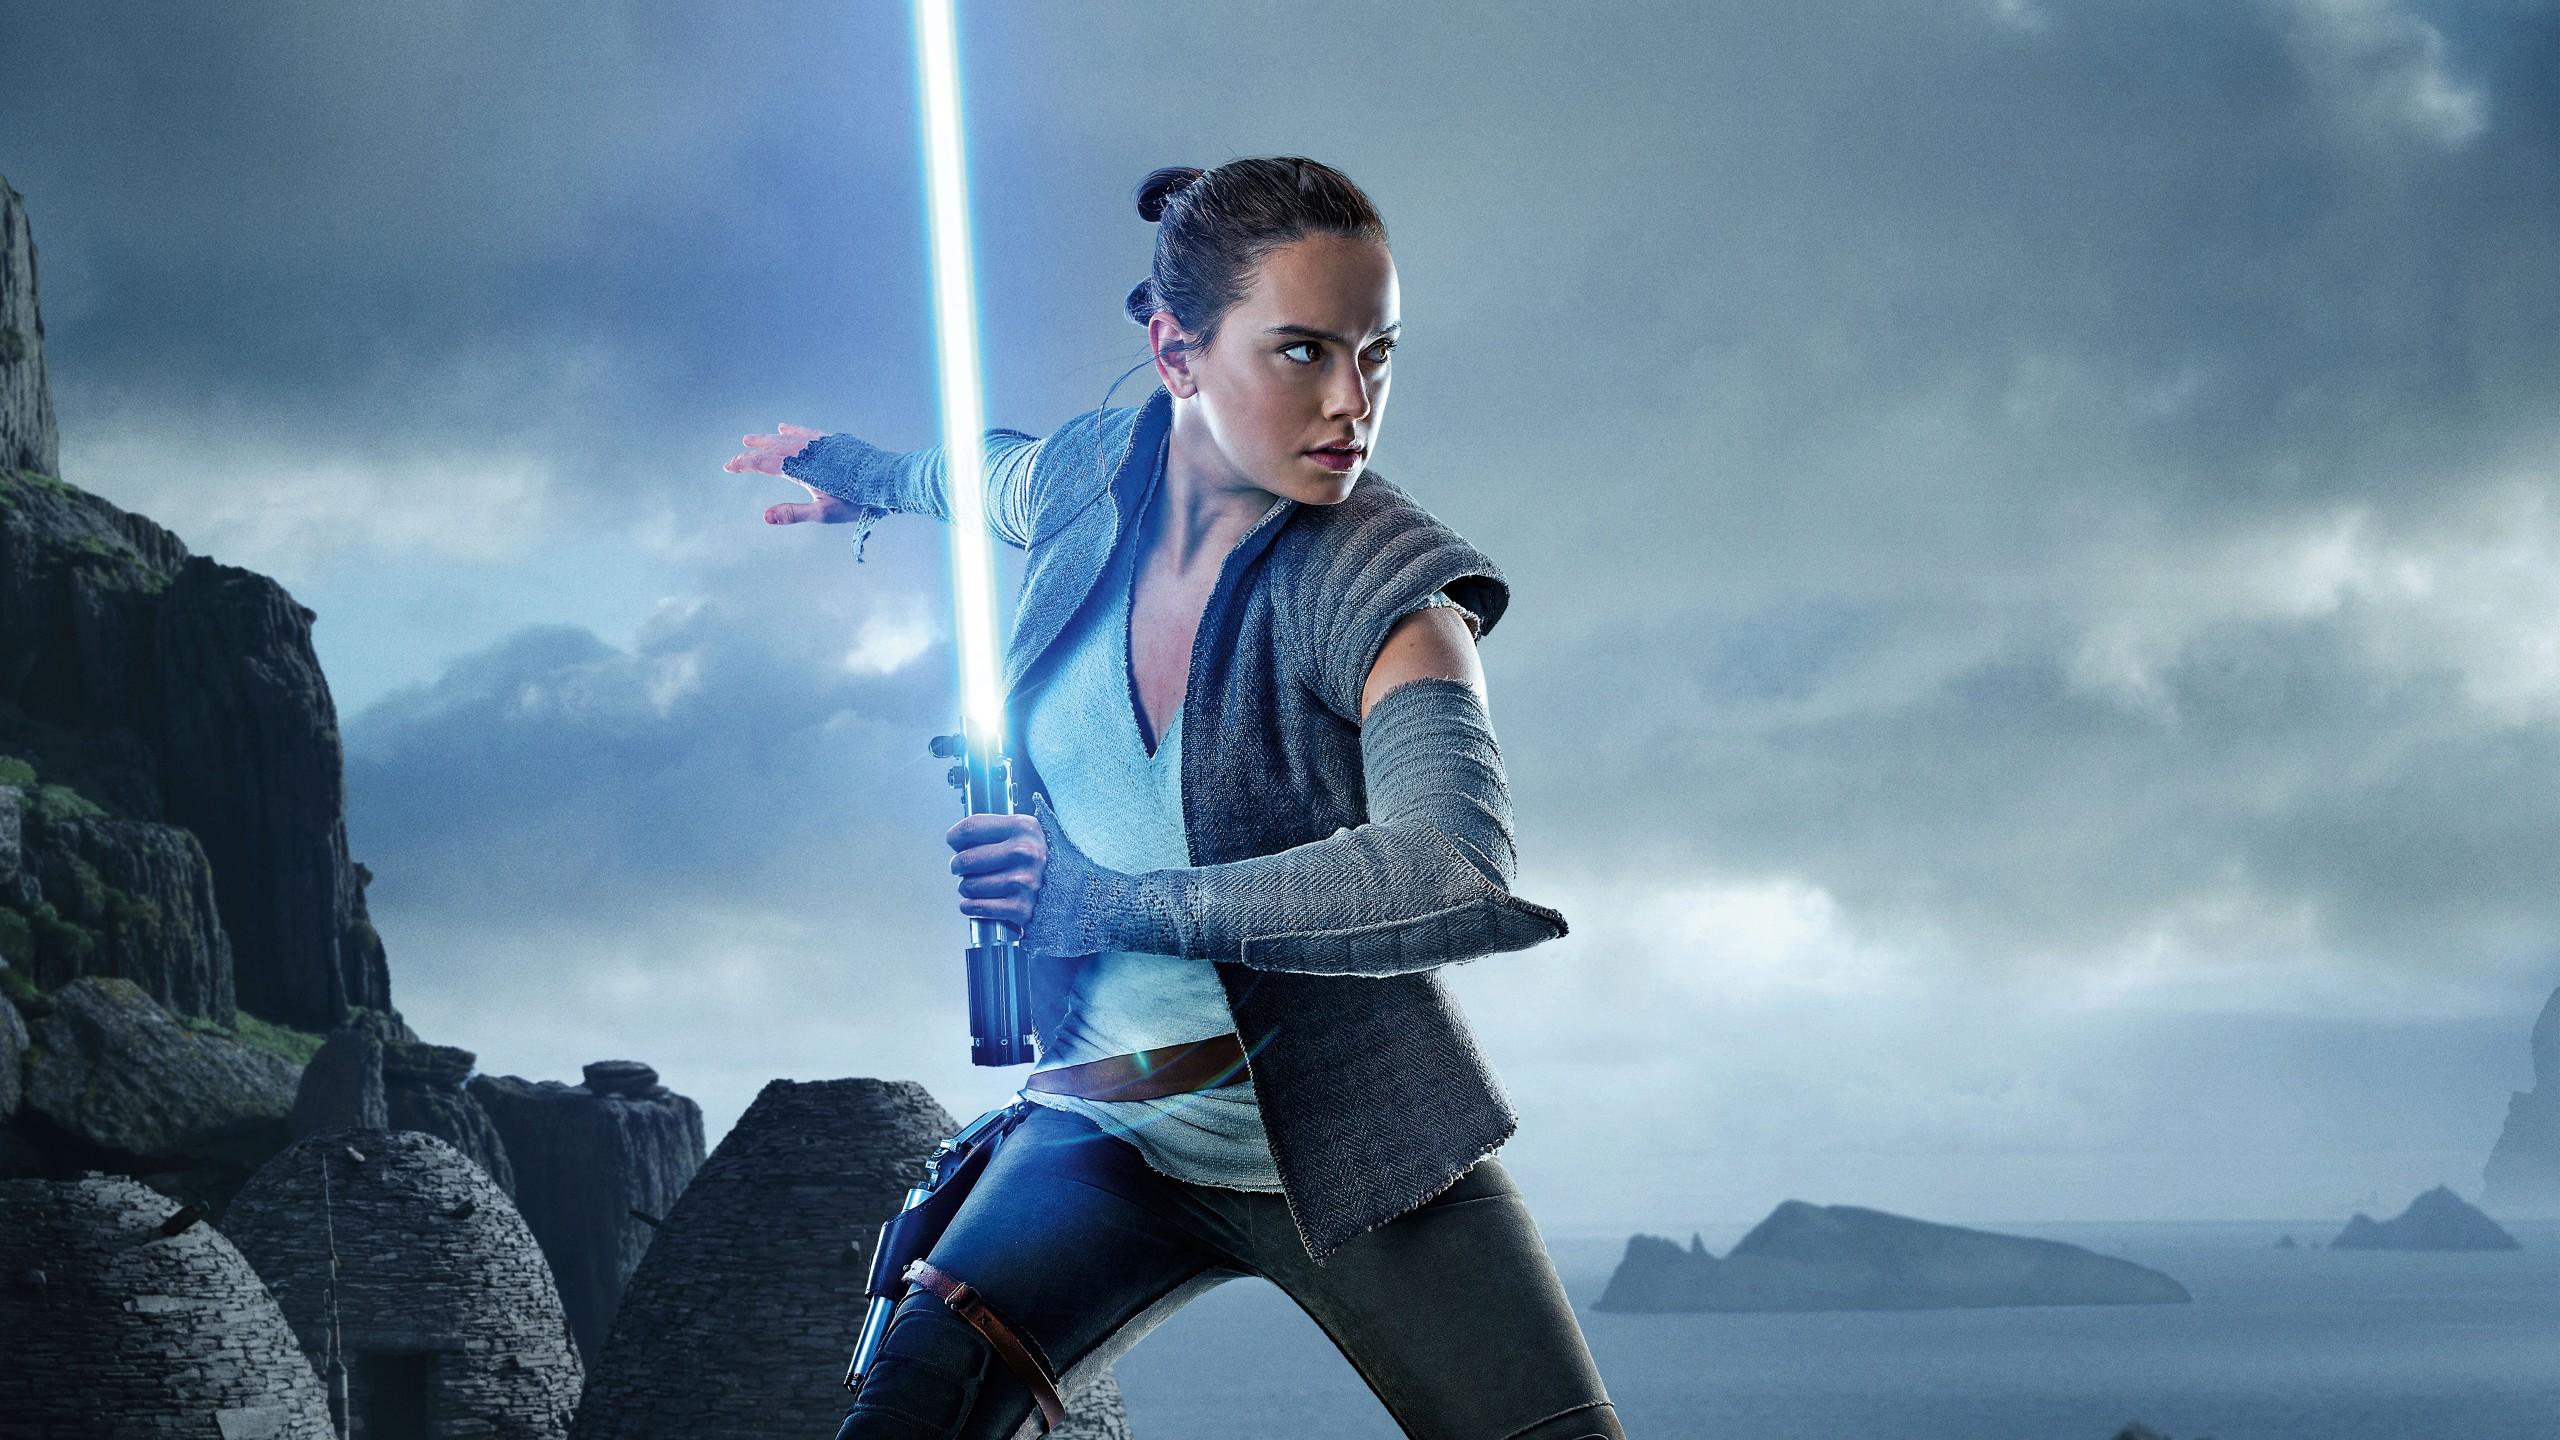 Iphone X Star Wars Wallpaper Daisy Ridley As Rey Star Wars The Last Jedi 5k Wallpapers